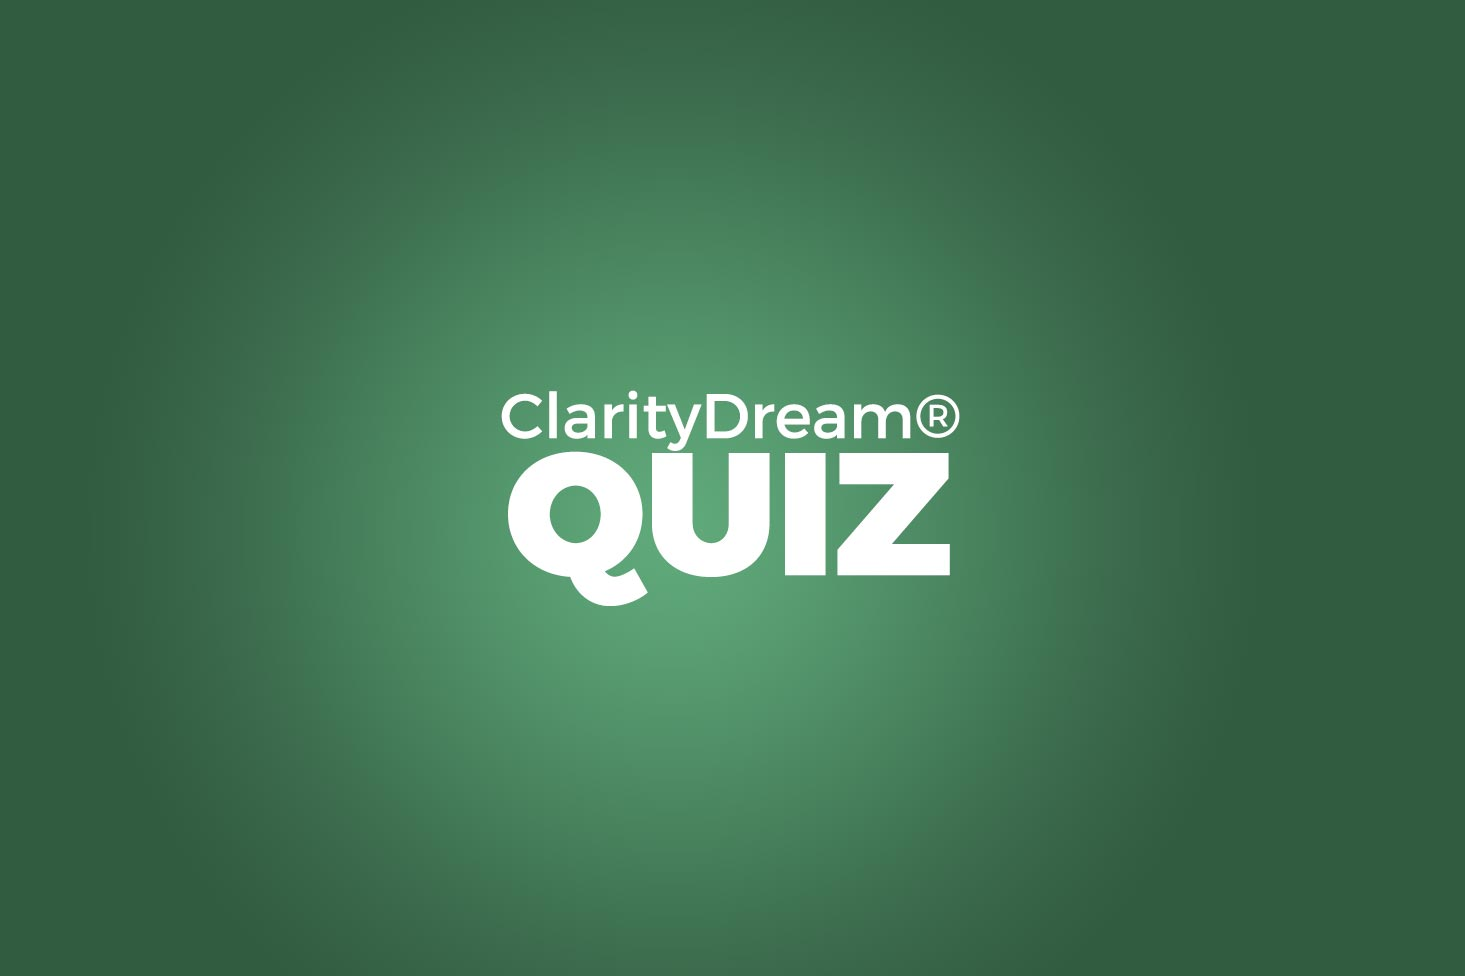 Shawn Brooks Clarity Dream quiz